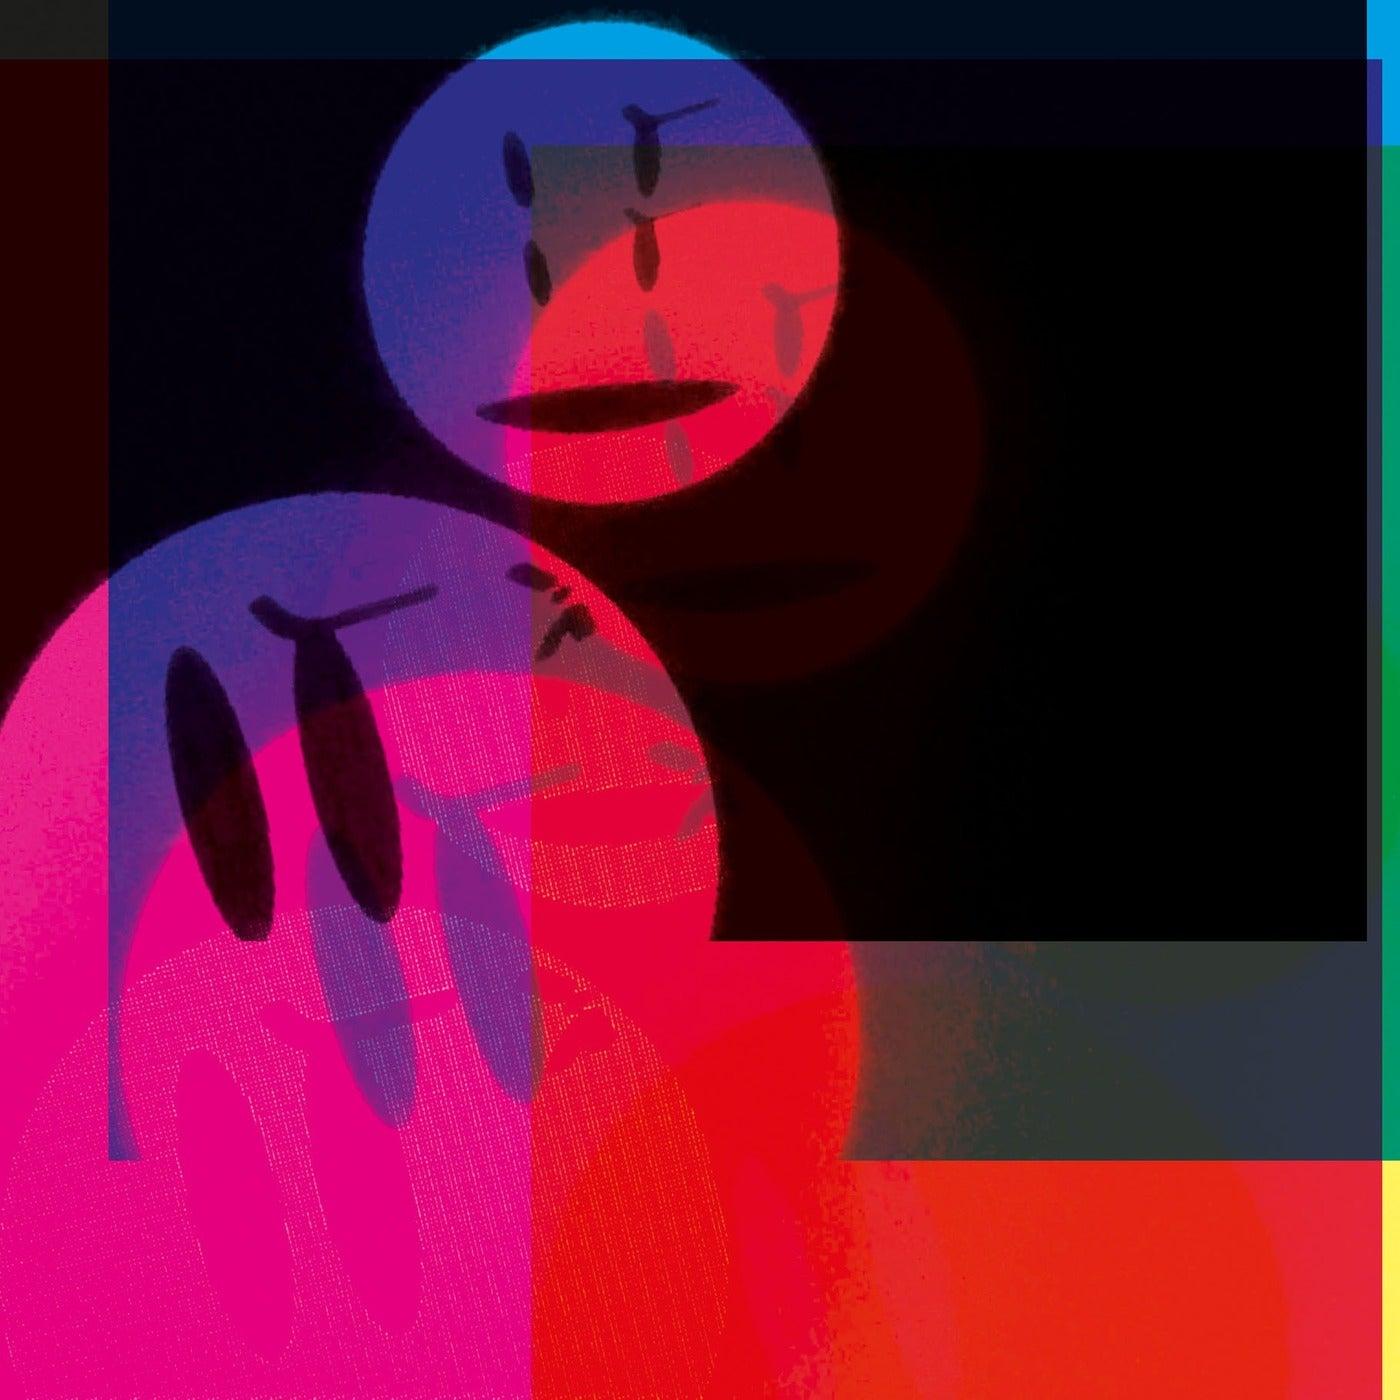 Acid Riot (Dirty Doering Remix)